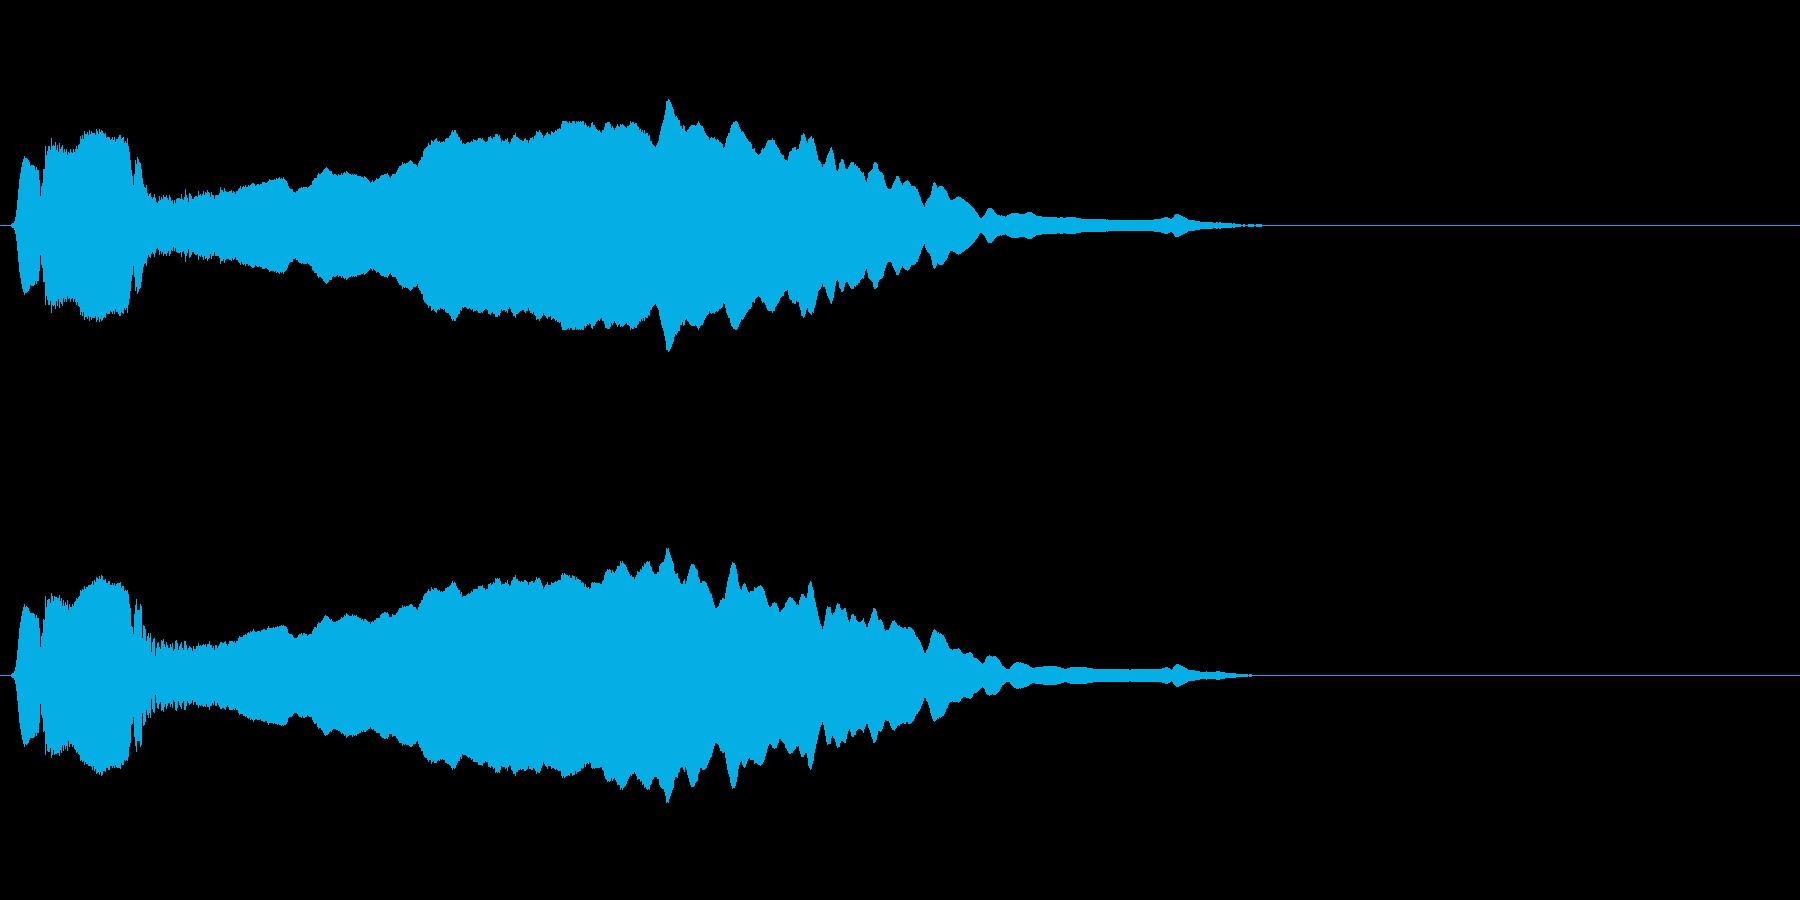 尺八 生演奏 古典風 残響音有 #2の再生済みの波形